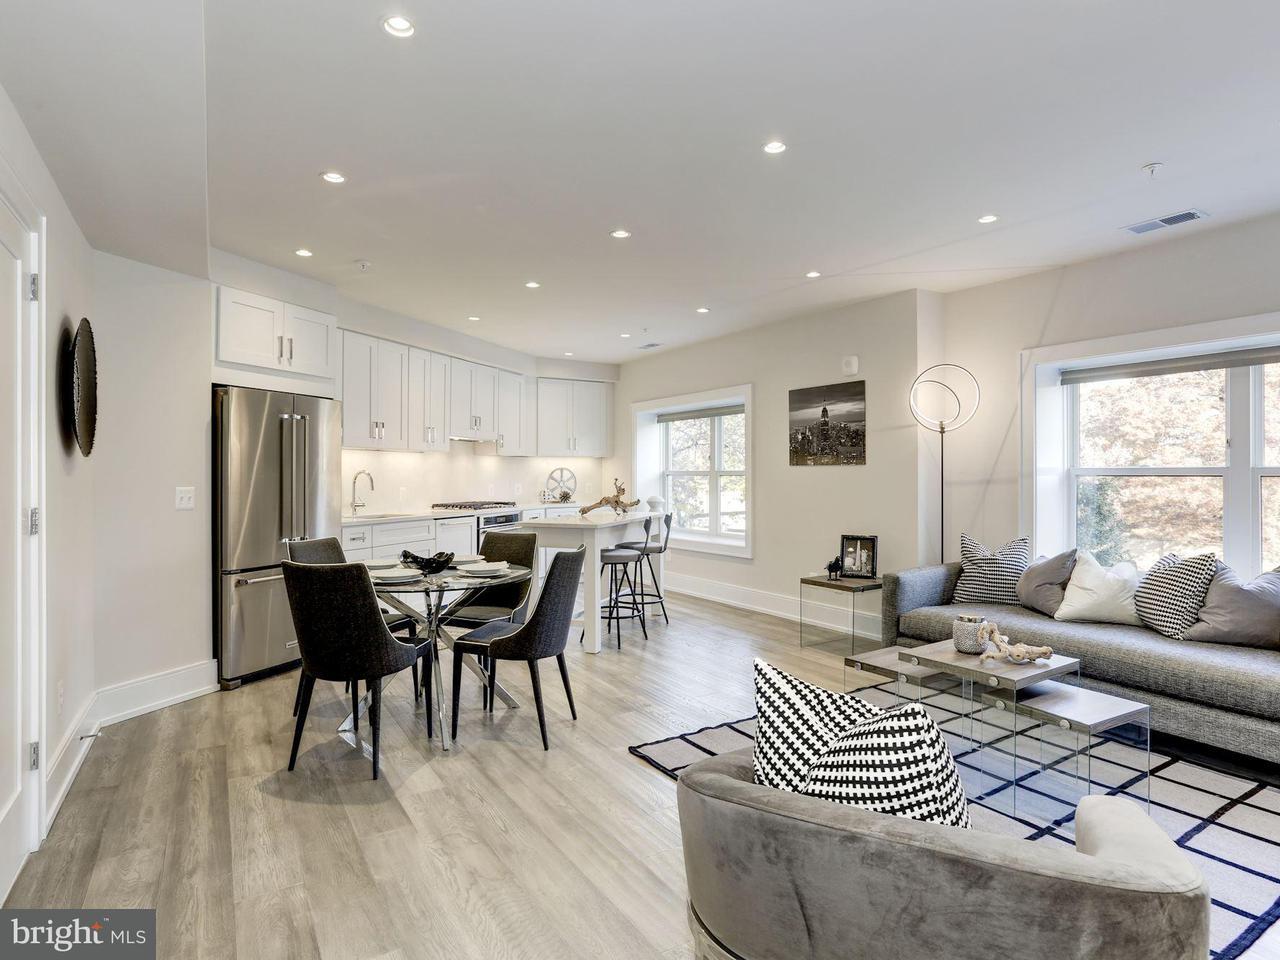 Additional photo for property listing at 2434 16th St Nw #201 2434 16th St Nw #201 Washington, Distrito De Columbia 20009 Estados Unidos